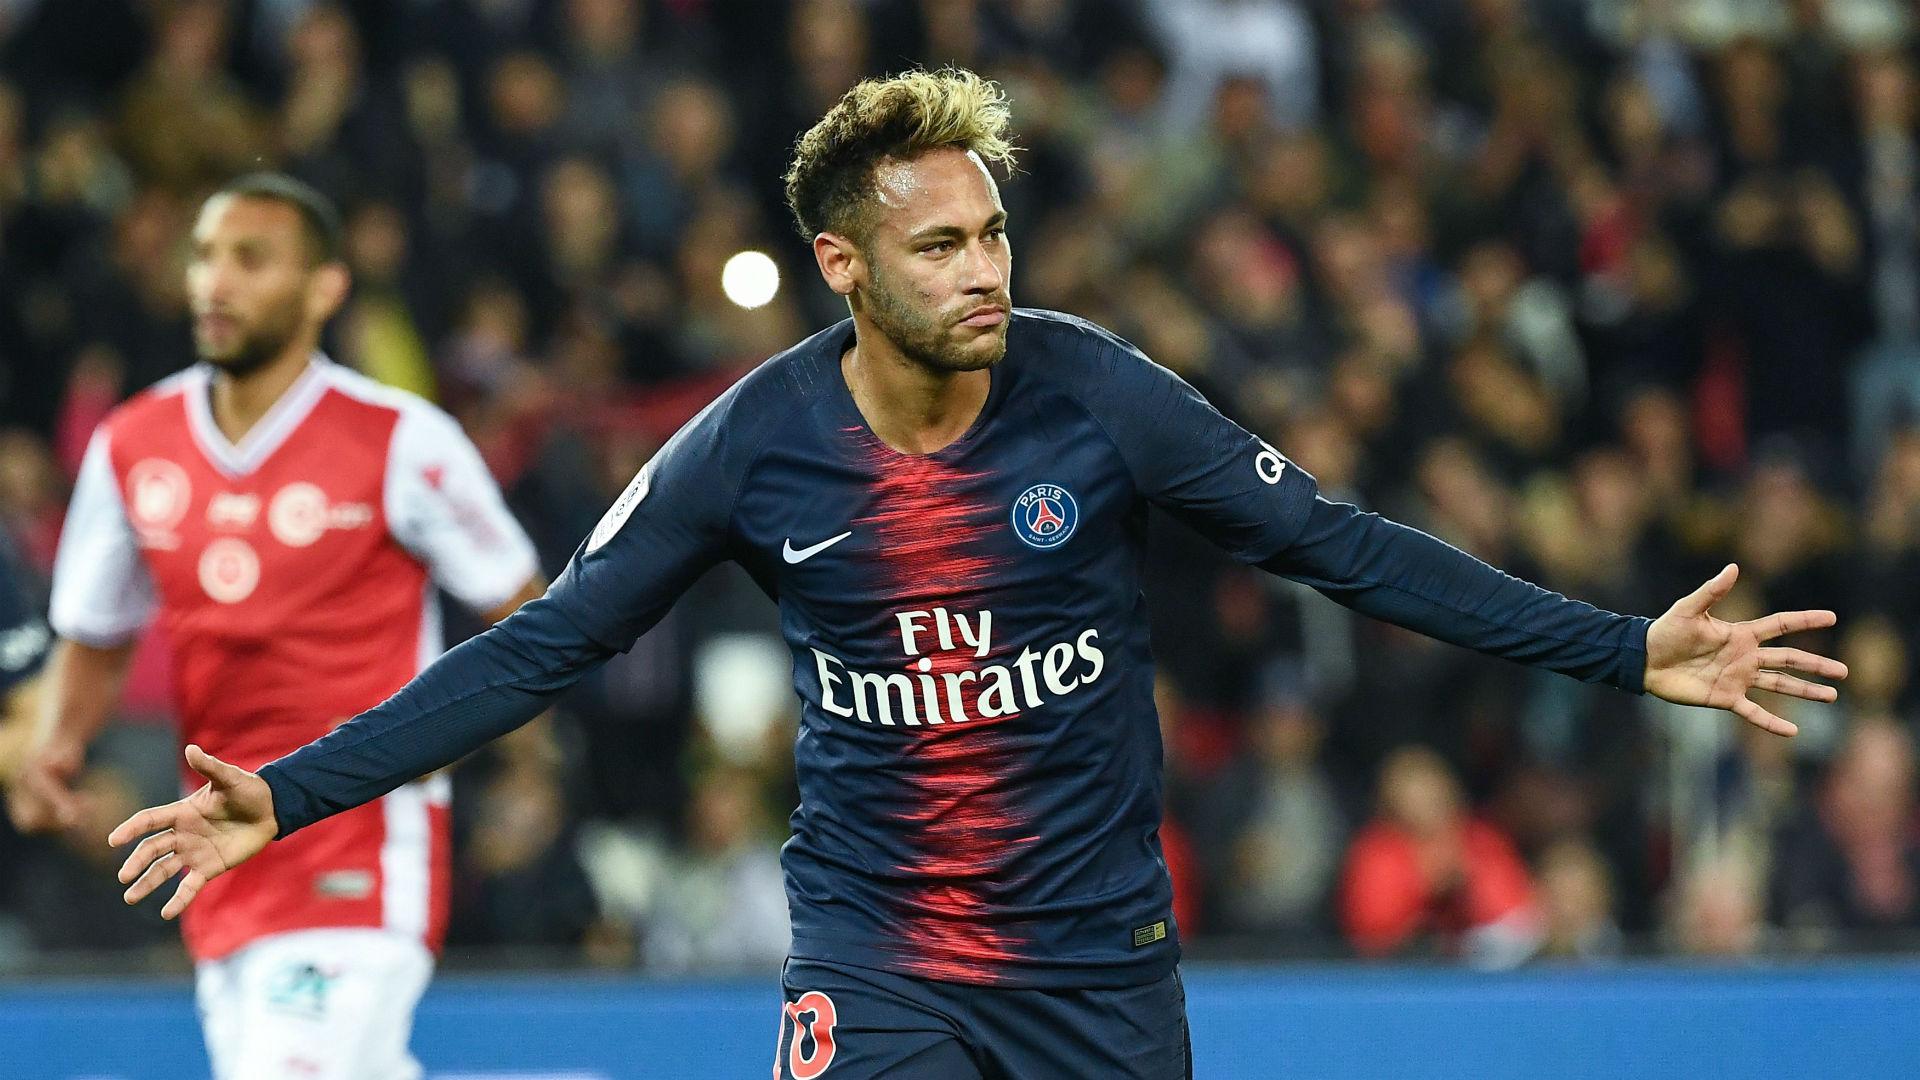 Neymar showboating annoys opponents, says Meunier